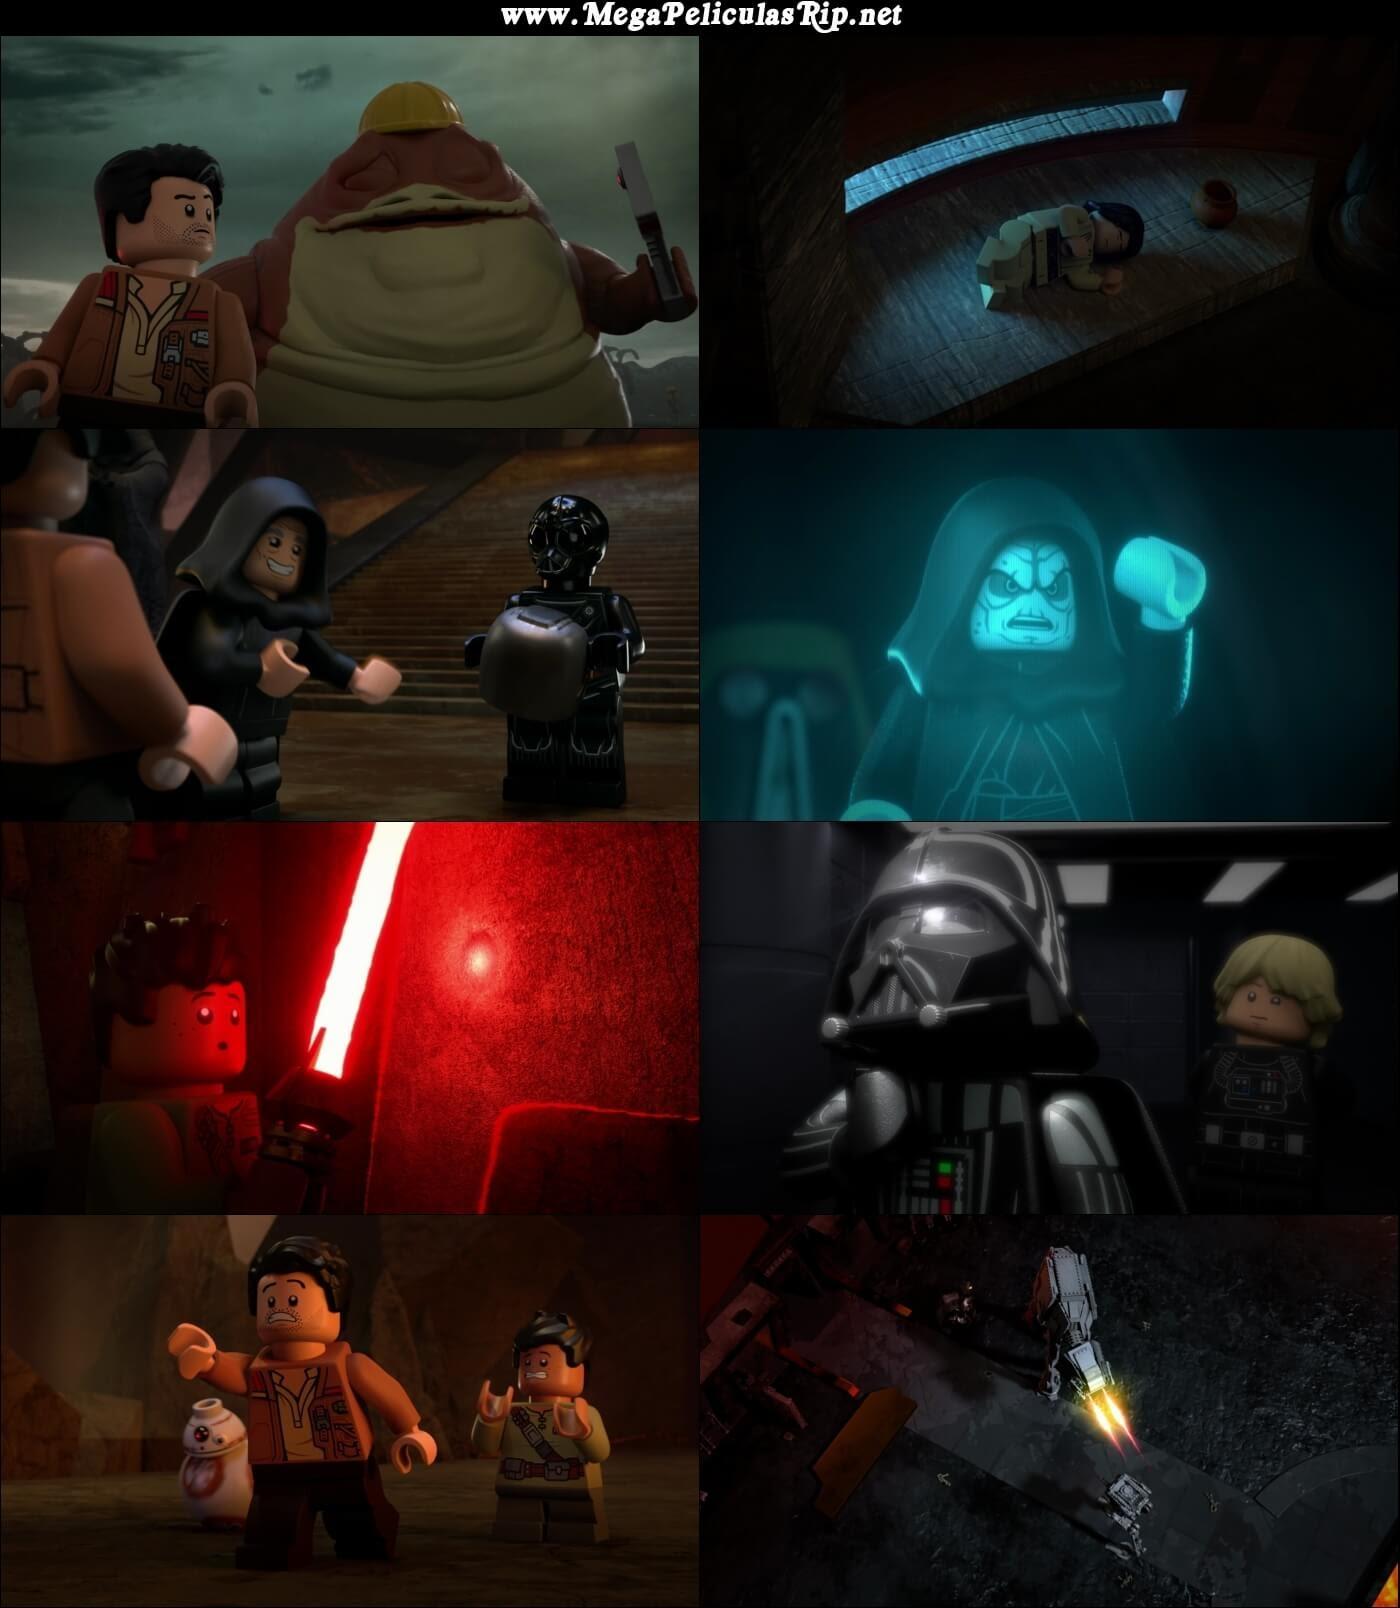 LEGO Star Wars Historias Aterradoras 1080p Latino